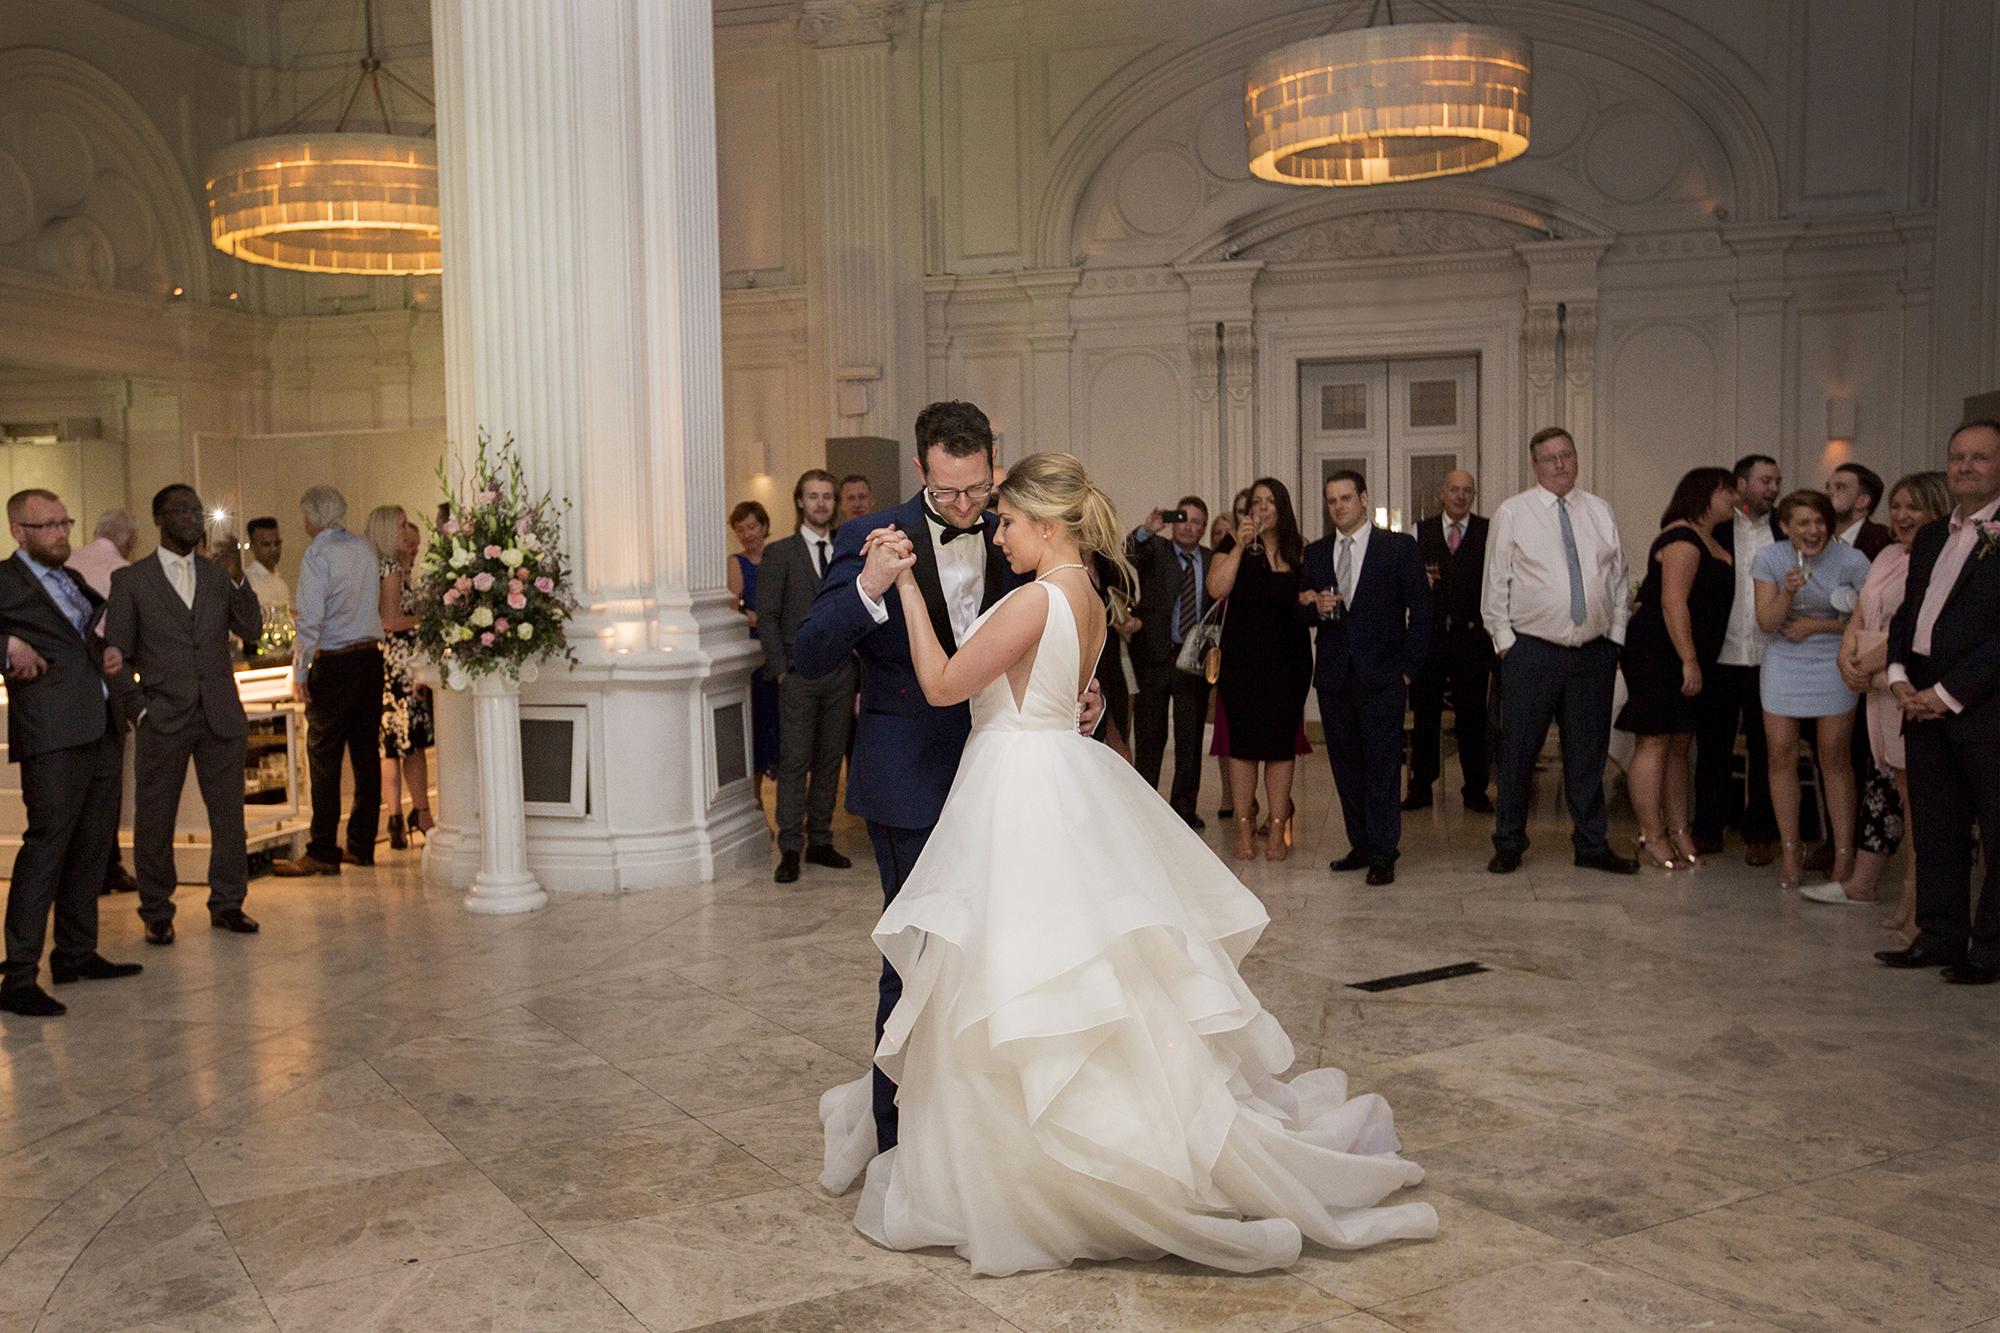 Andaz_hotel_Iain_&_Becca's_wedding